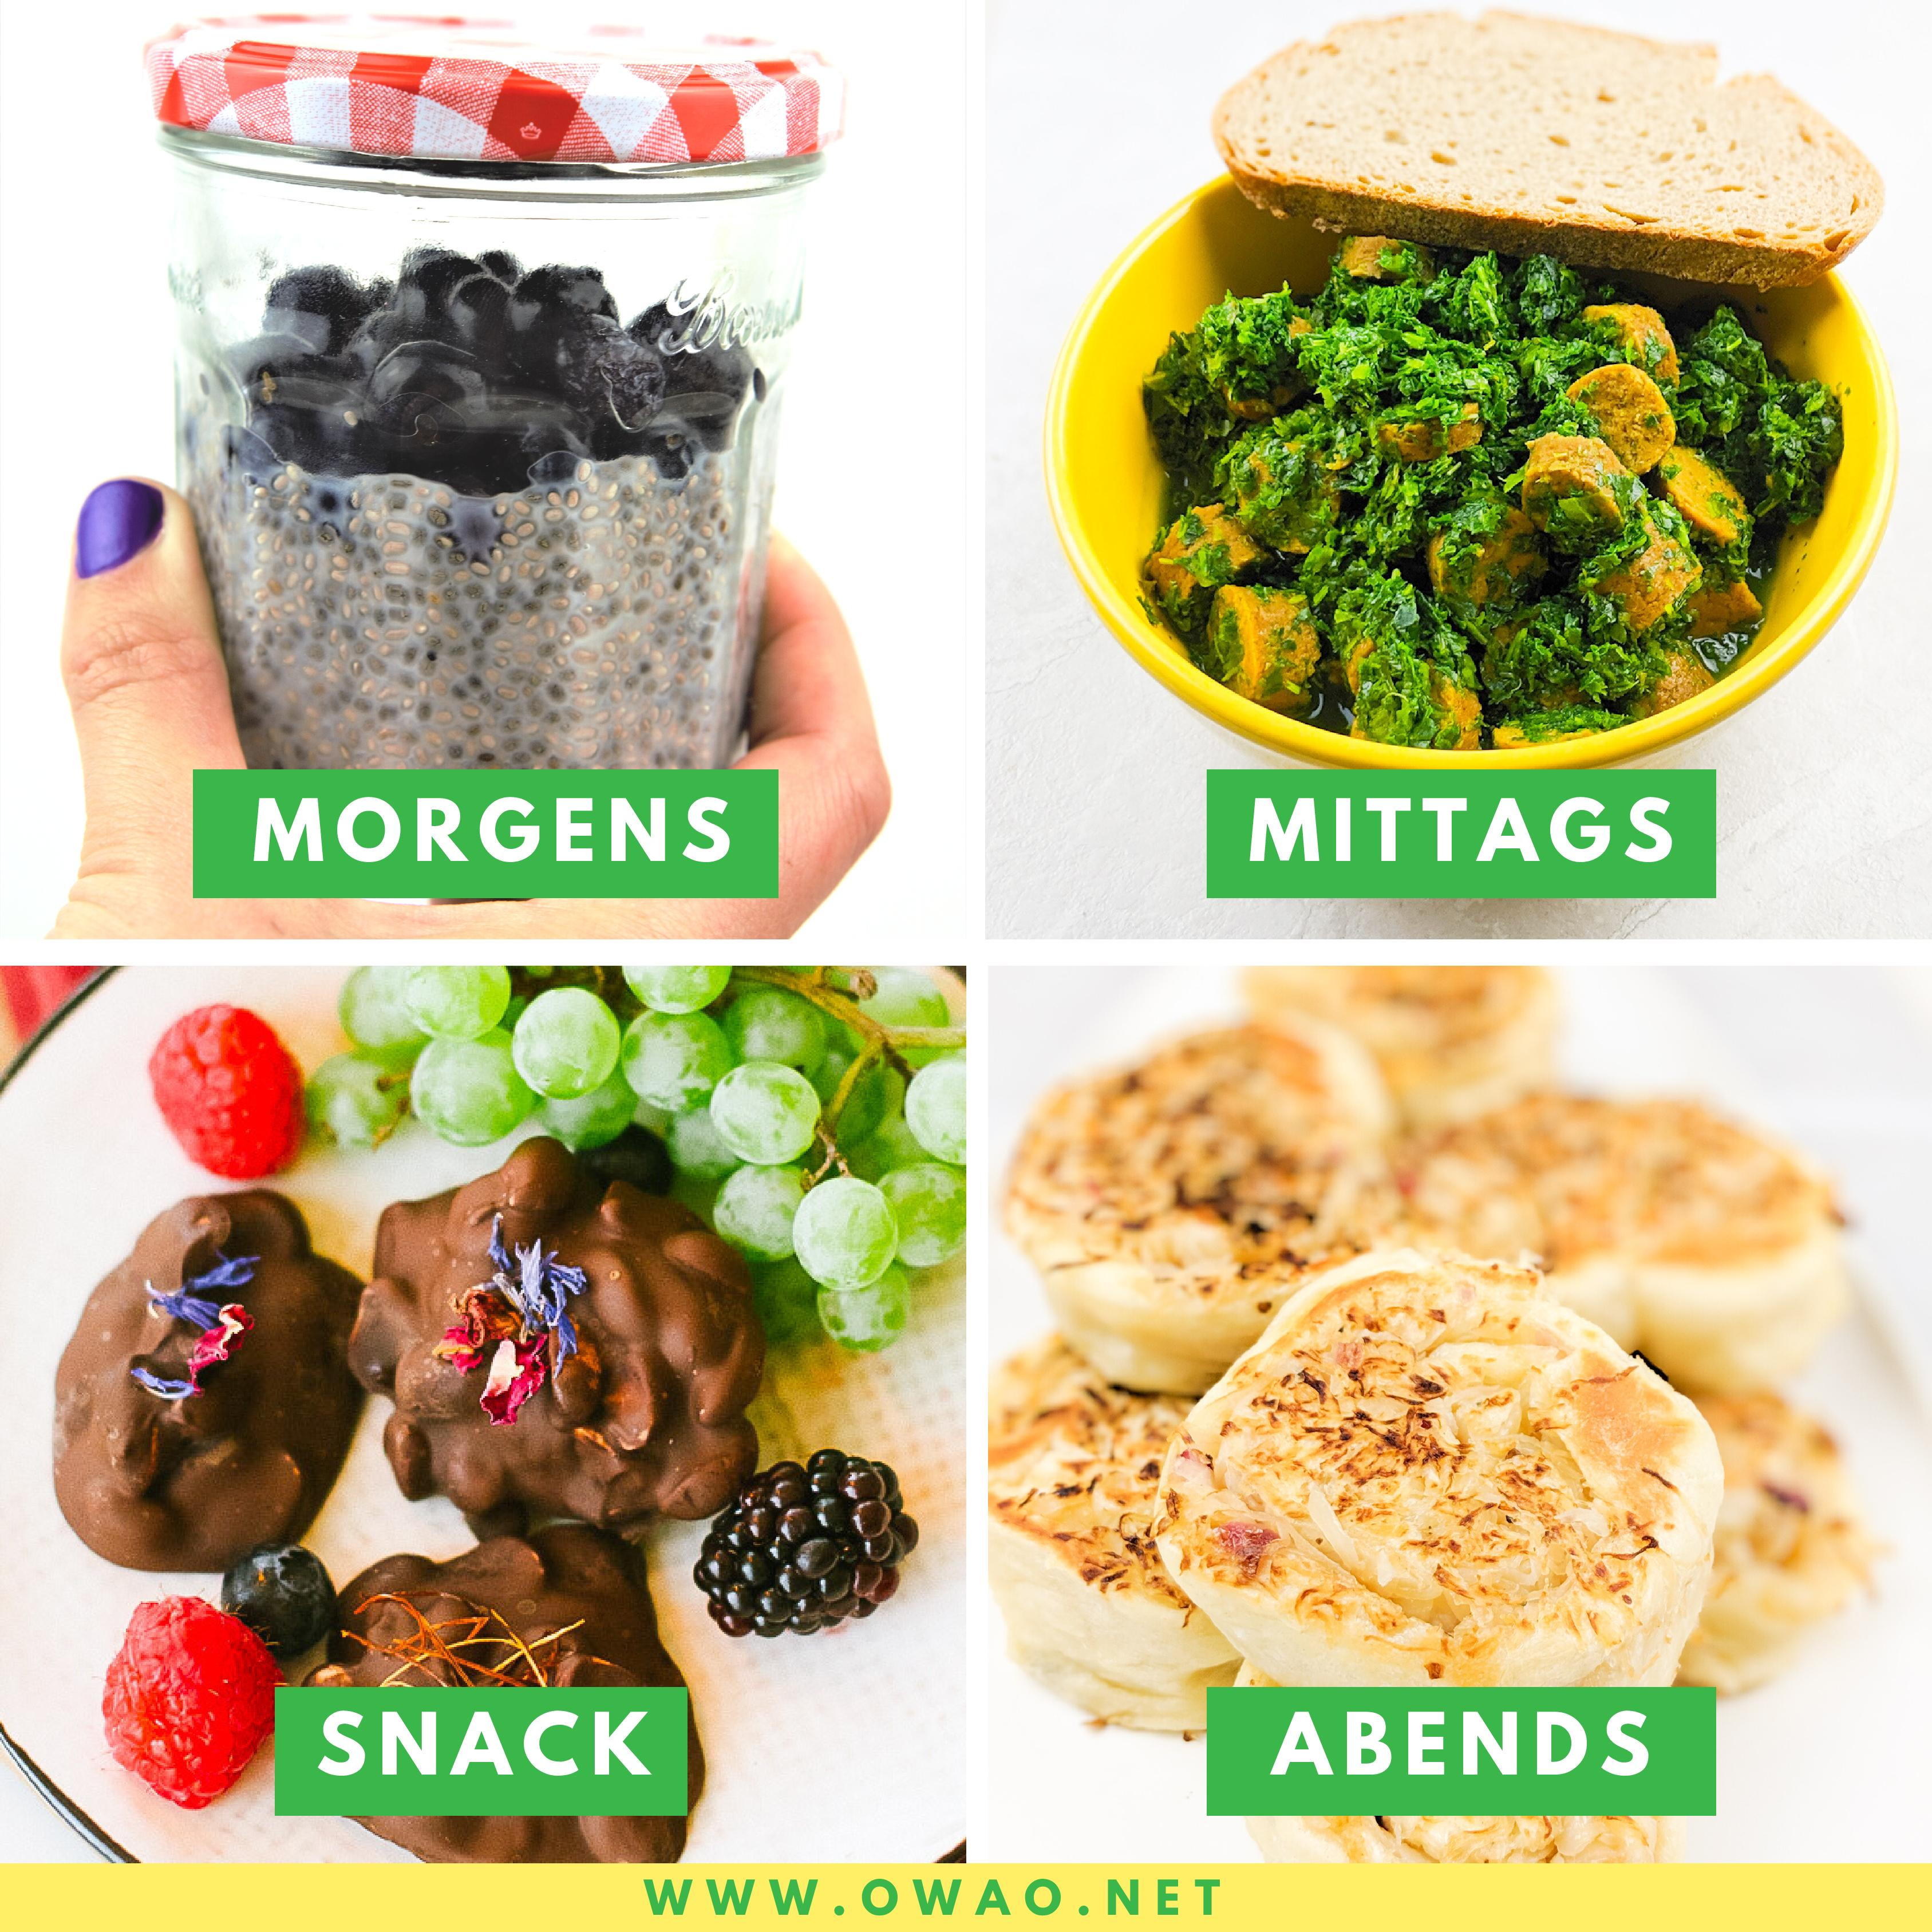 Gewichtsabnahme-vegan abnehmen-Fett reduzieren-OWAO!-Meal Prep-Meal Prep vegan